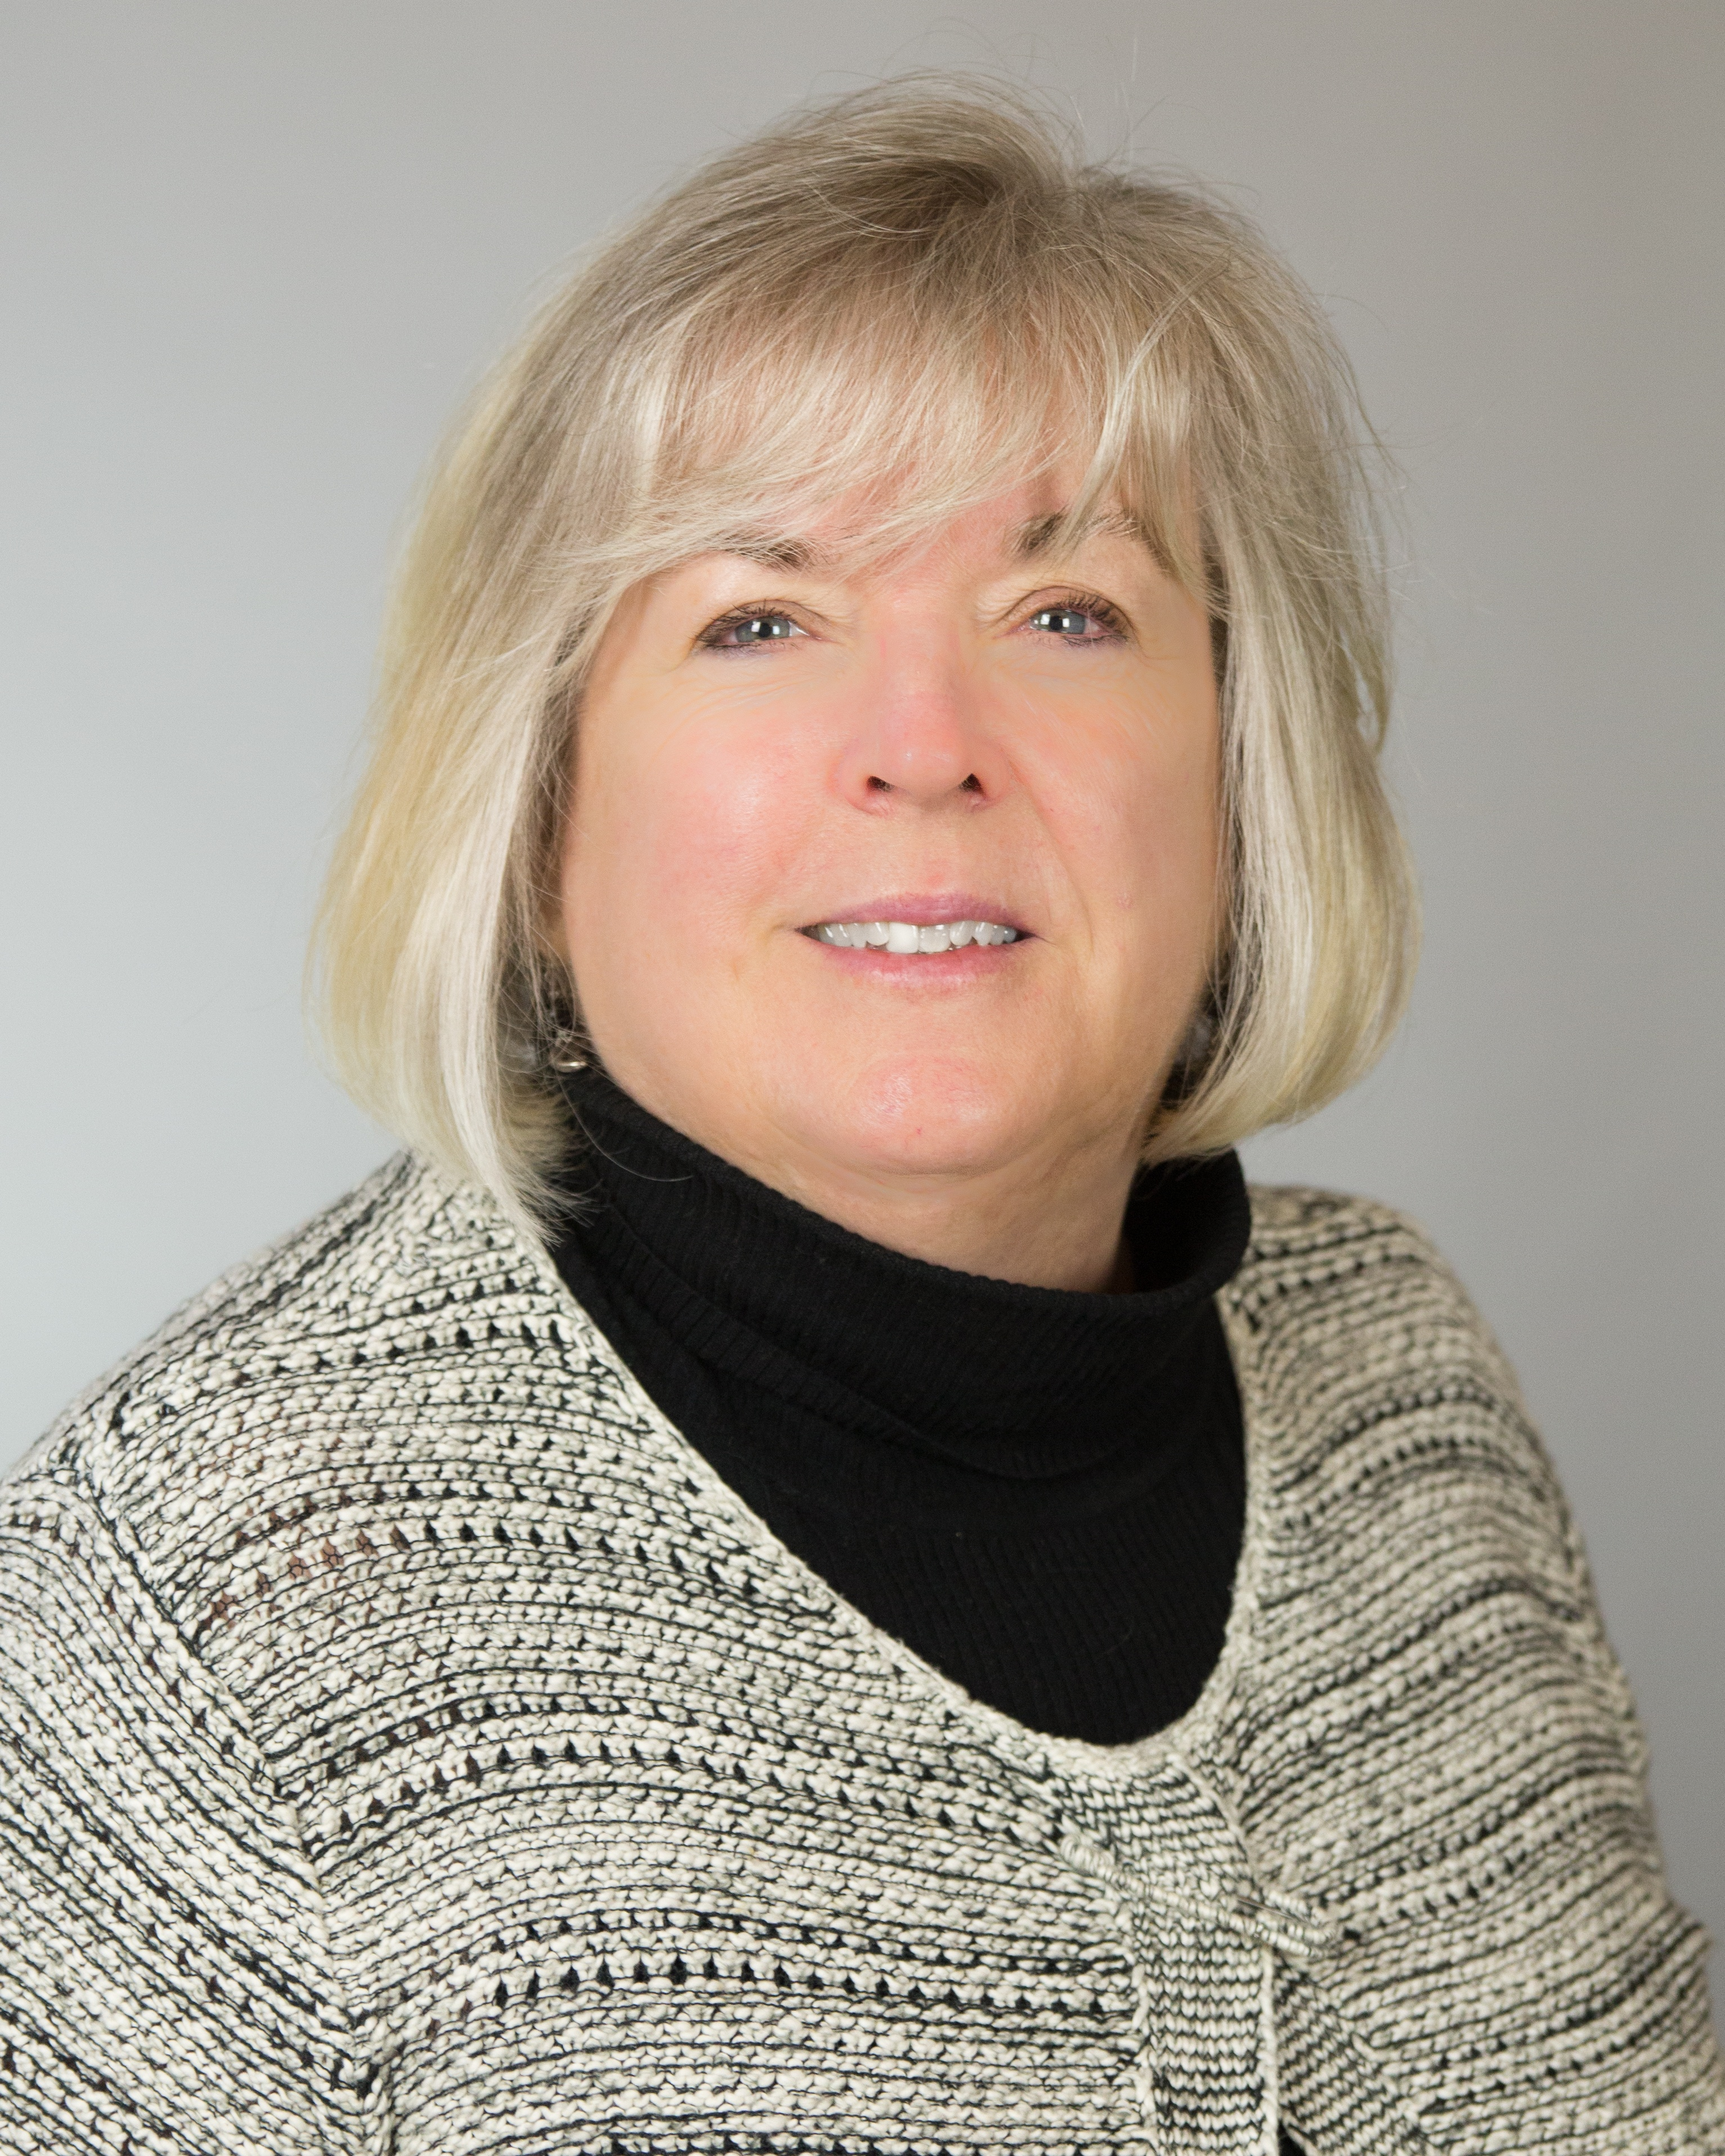 Cheryl Slobodian, Director of Strategic Partnerships at CMTC